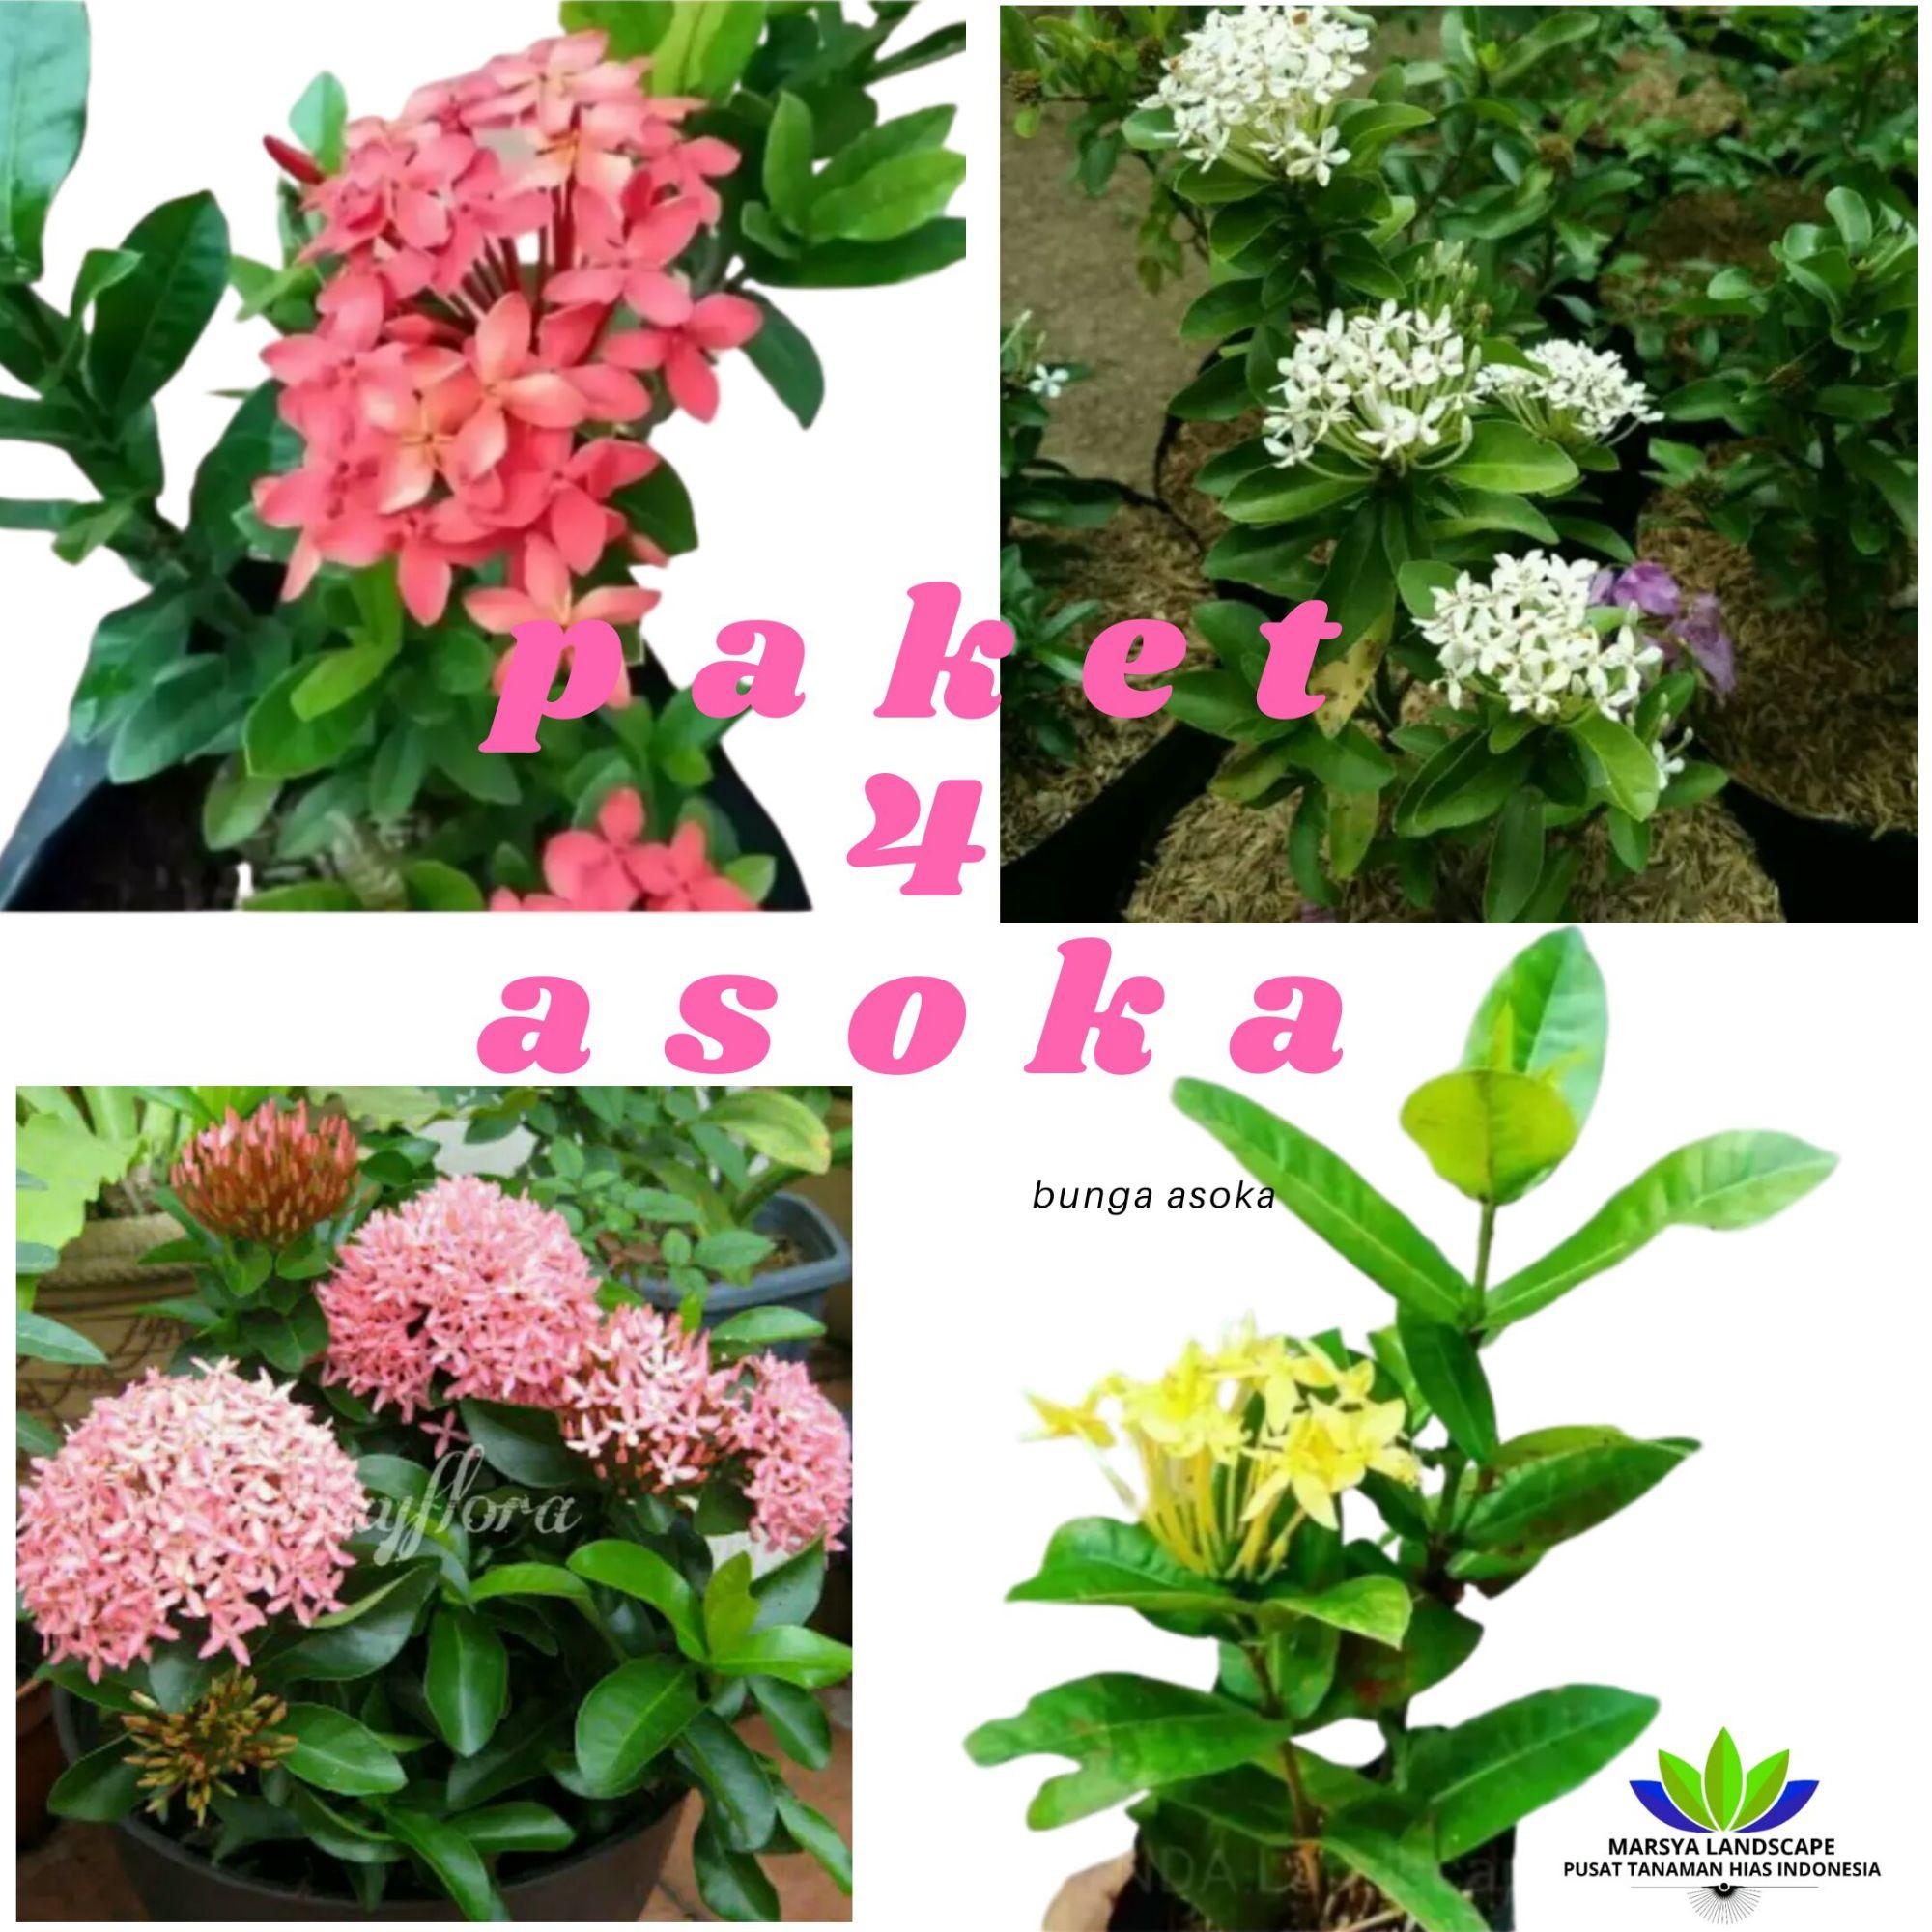 Tanaman Hias Paket Hemat 4 Jenis Bunga Asoka Pink Kuning Merah Putih Lazada Indonesia